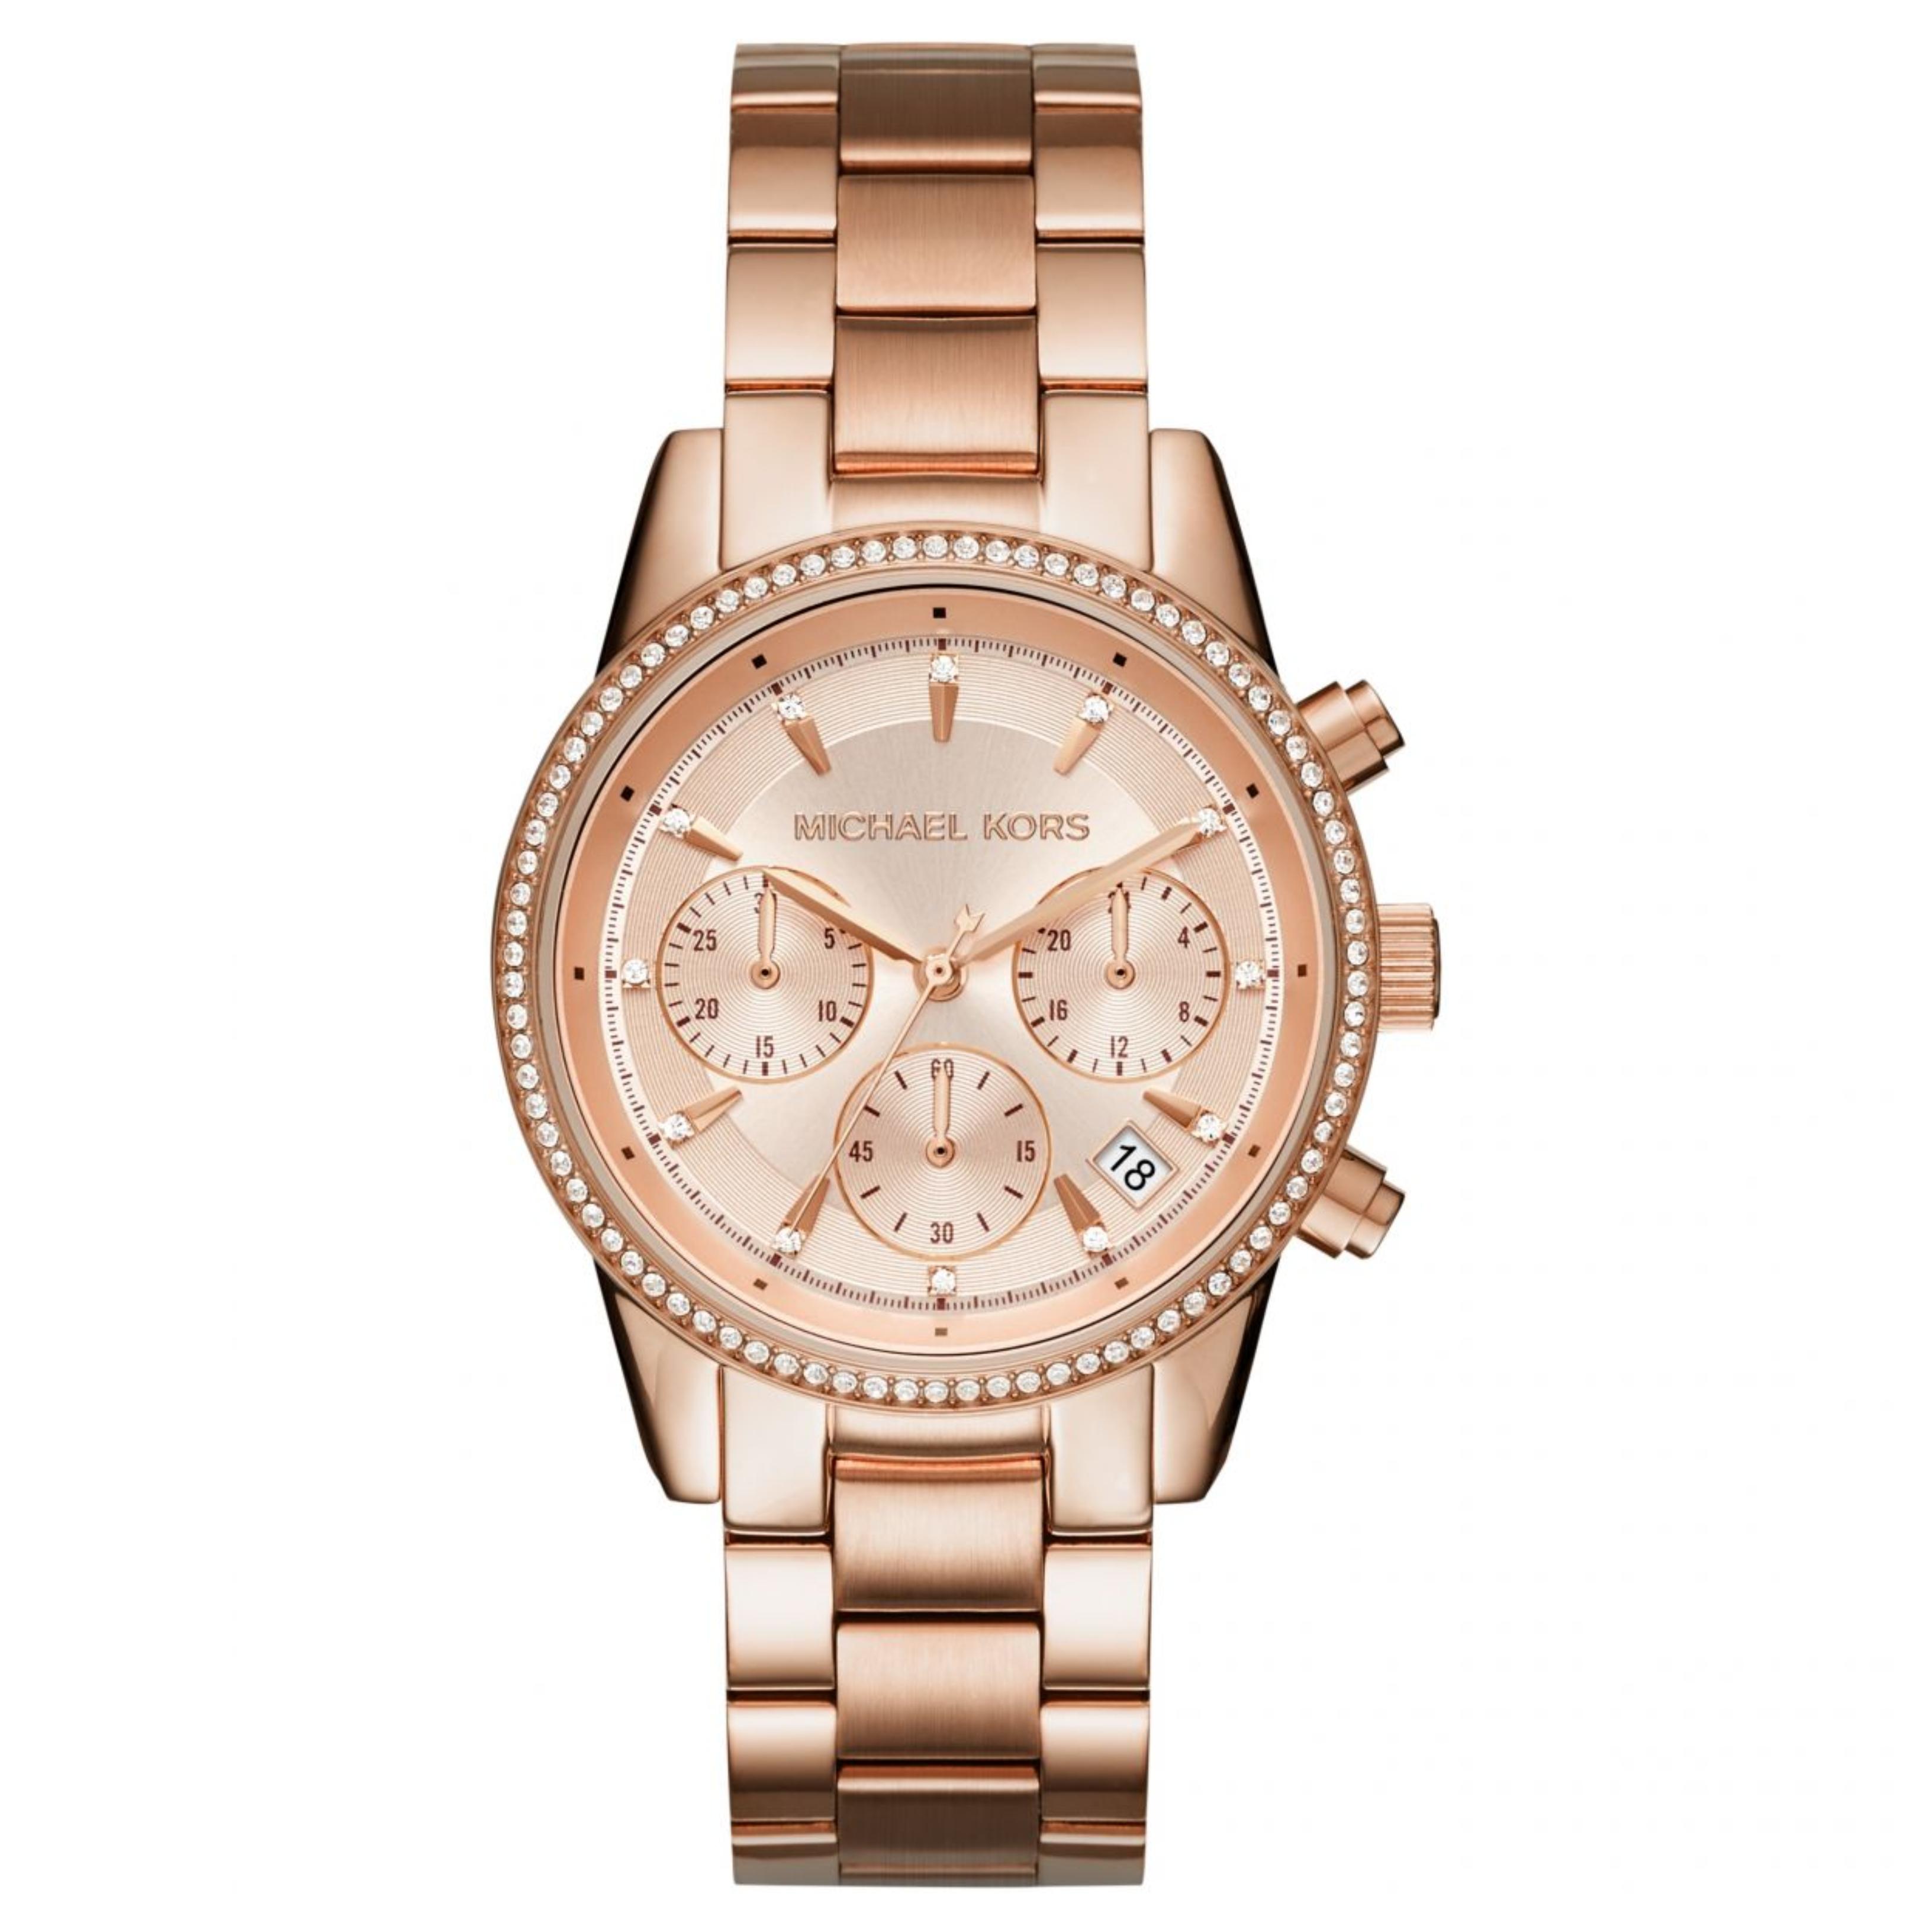 2edf64c36c1eb Sentinel Michael Kors Ritz Women Watch MK6357│Crystal Index Dial│Rose Gold  Bracelet Band